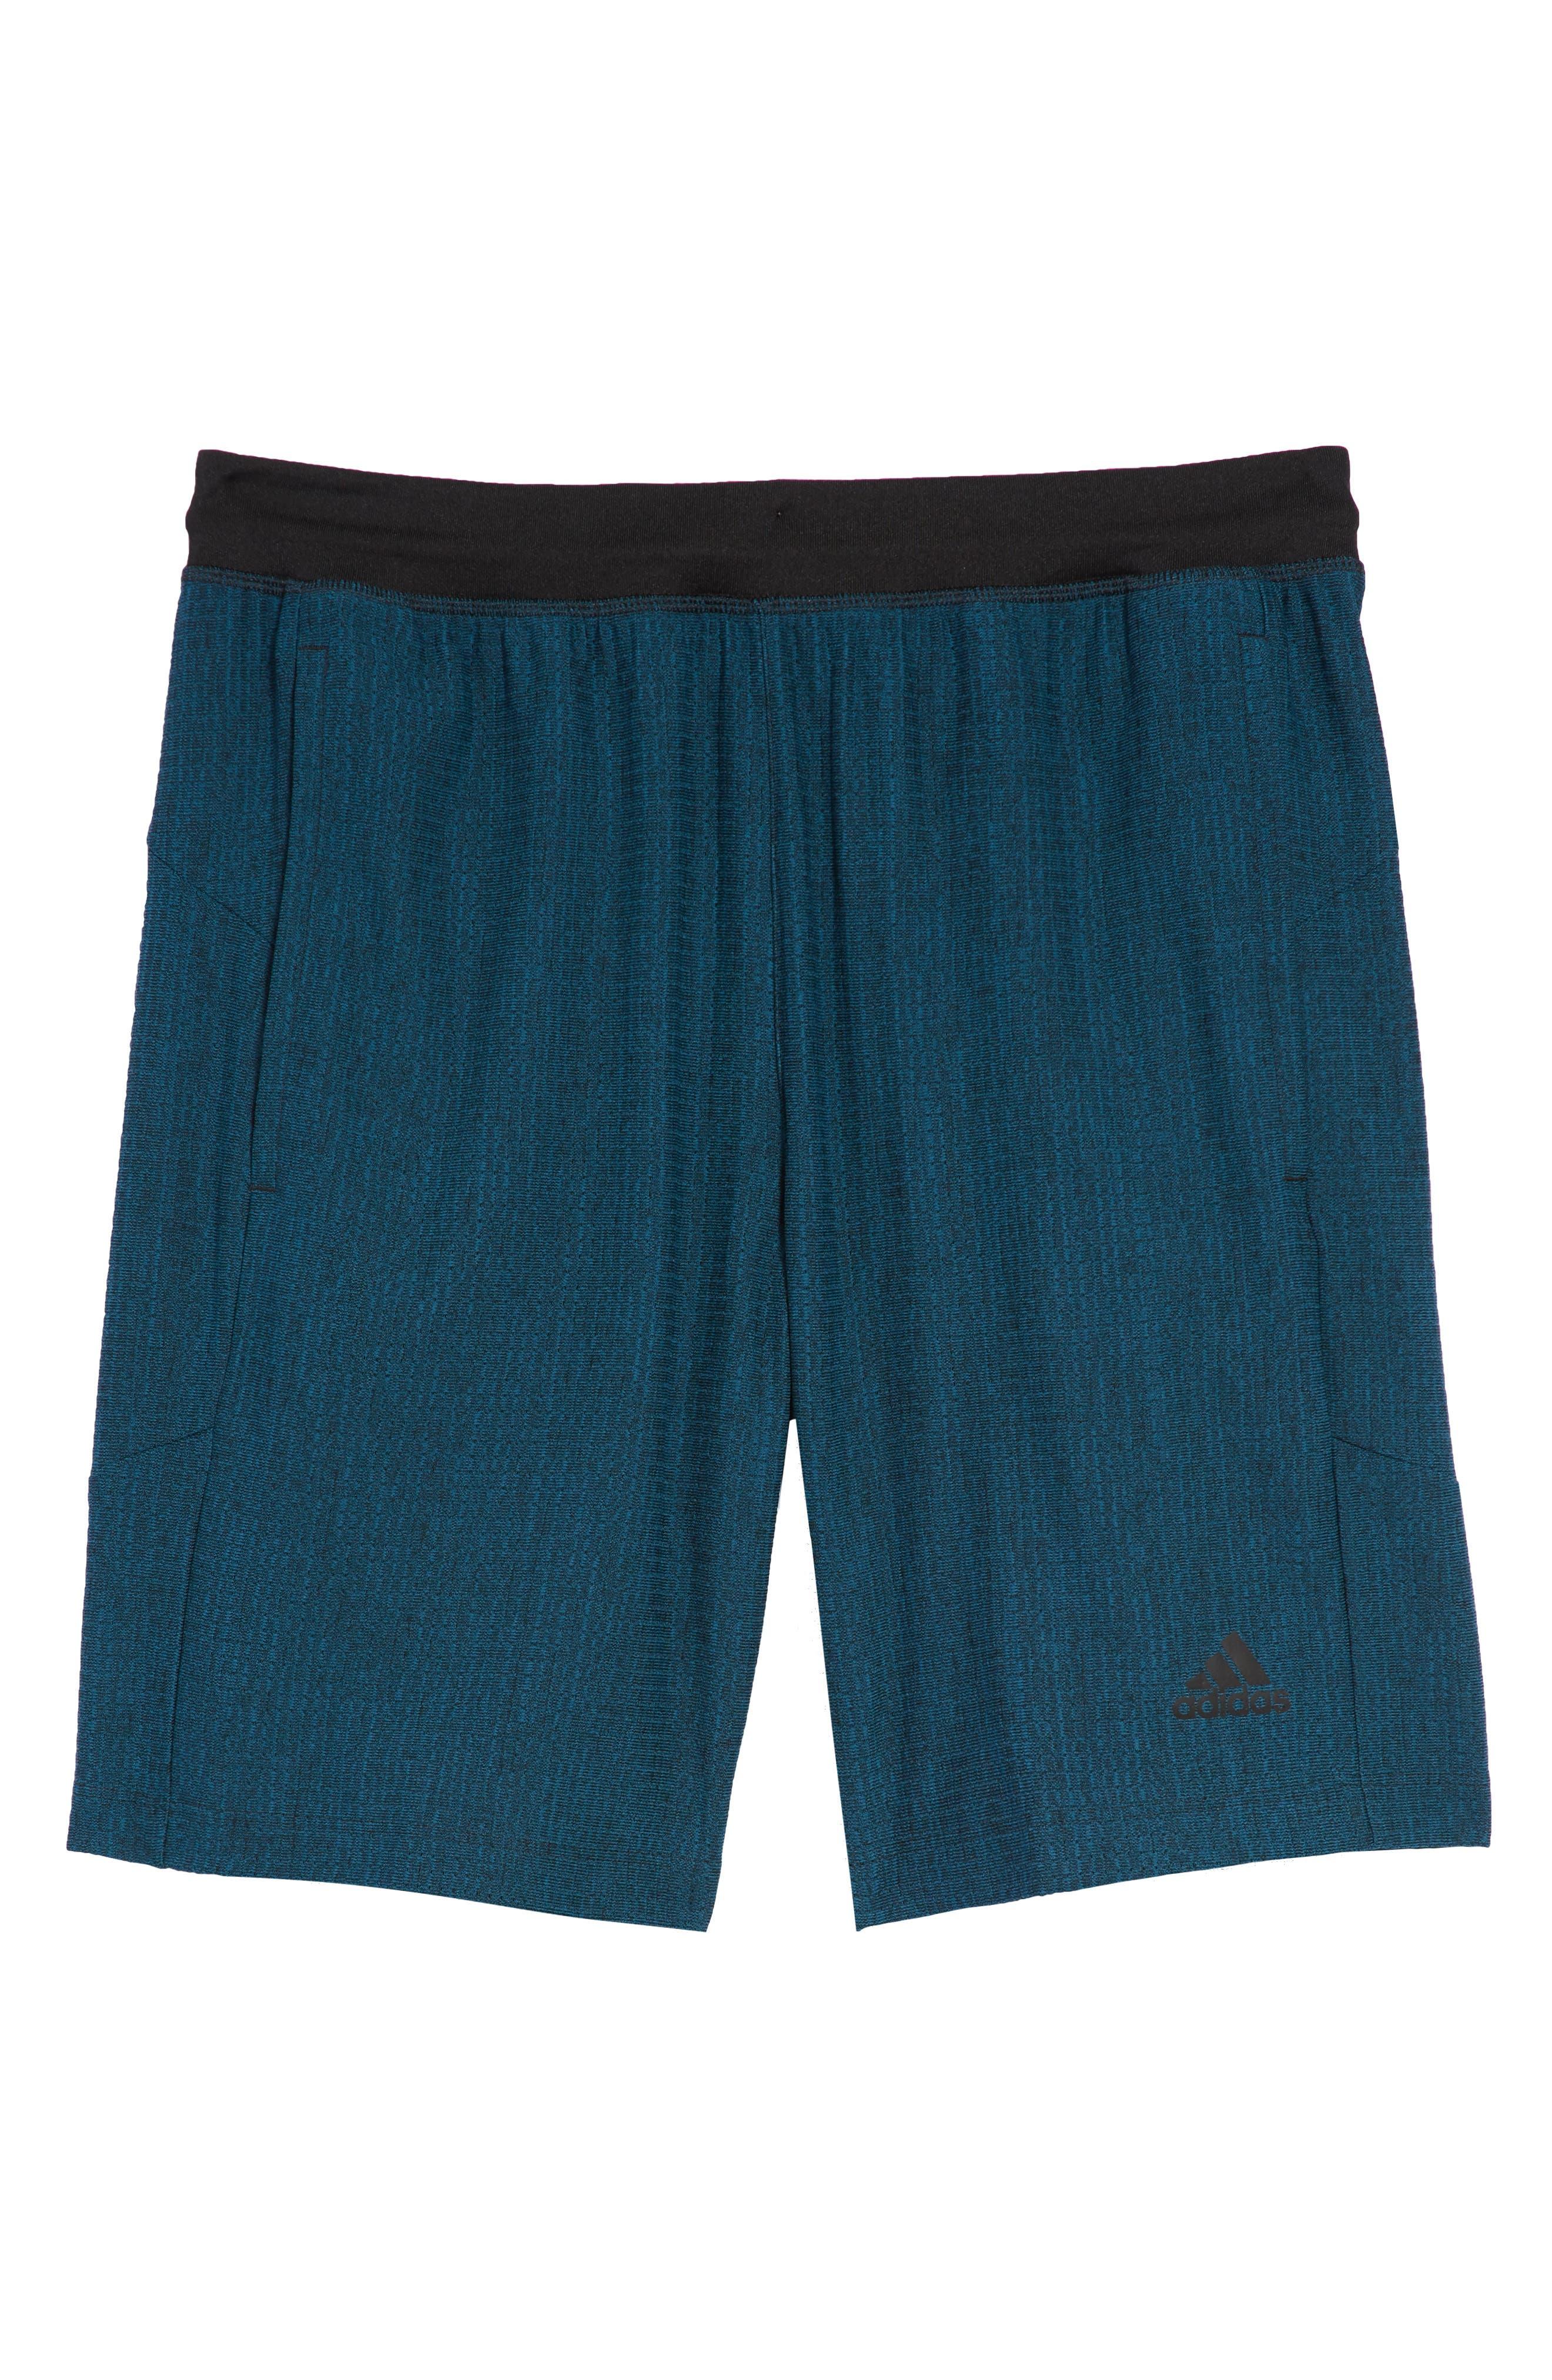 Speedbreaker Shorts,                             Alternate thumbnail 6, color,                             Real Teal